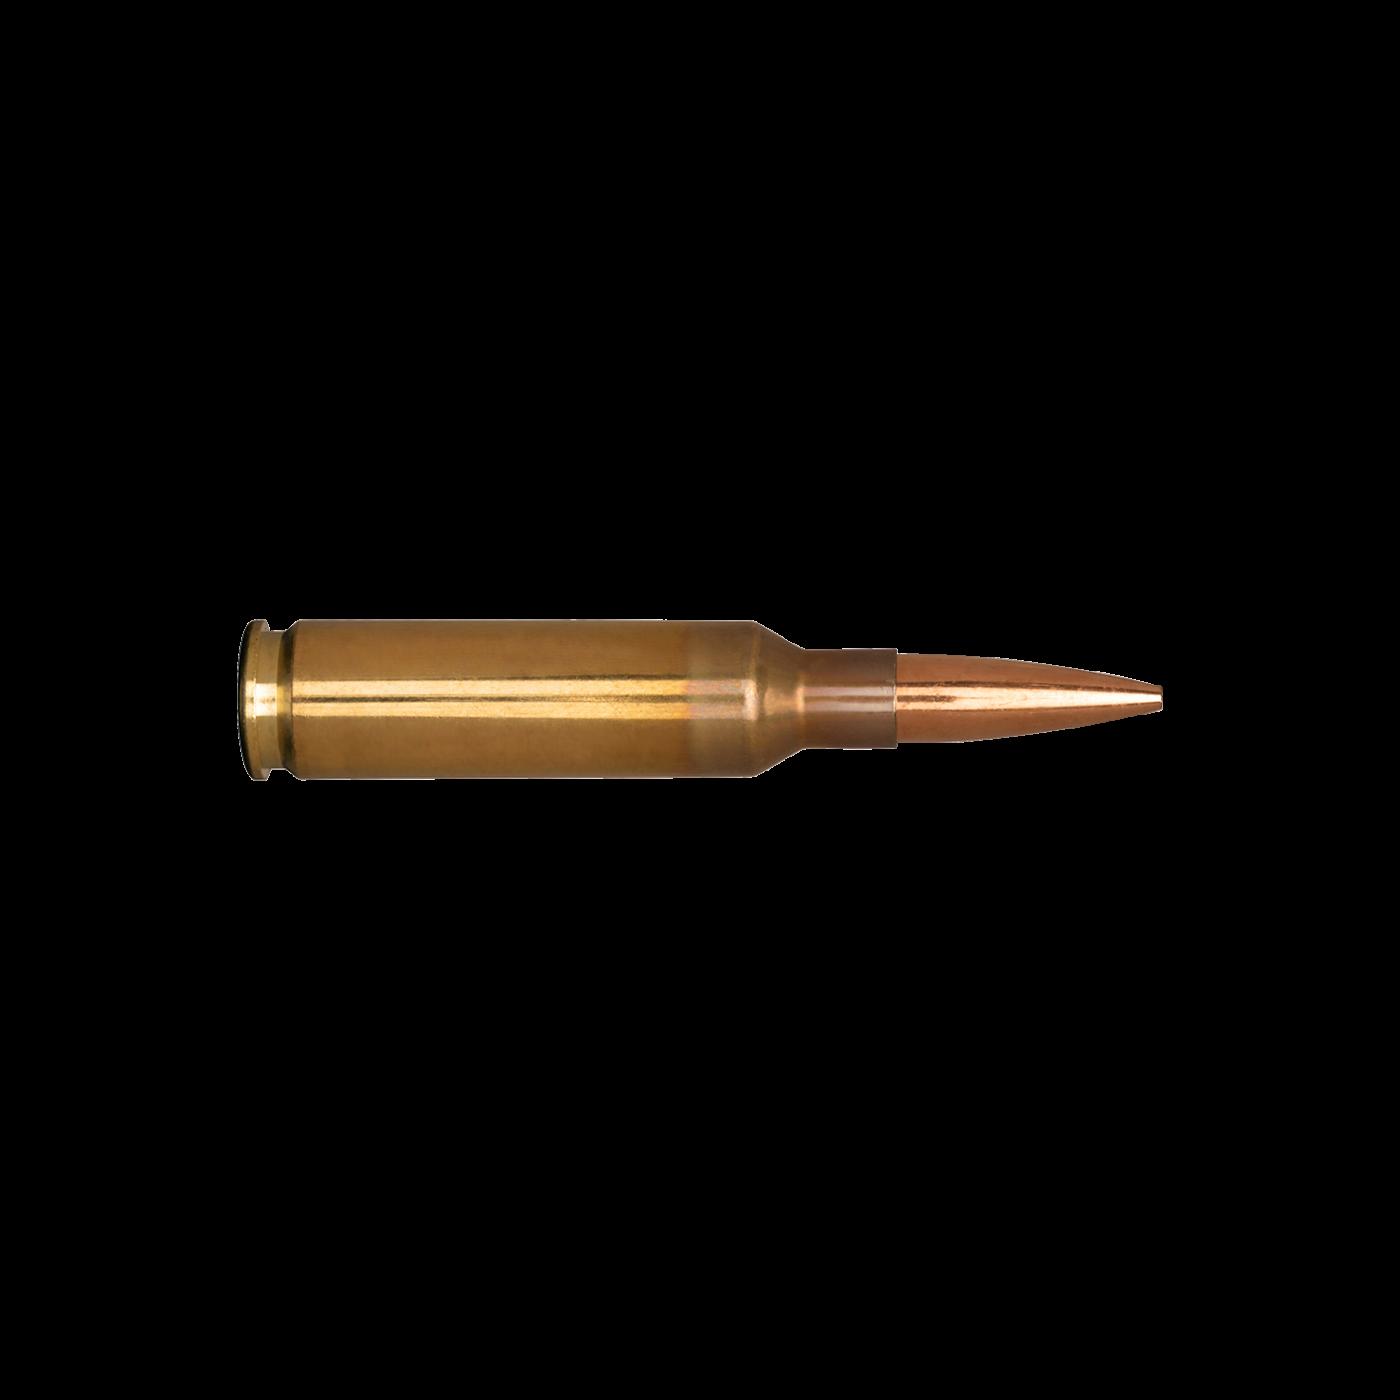 image of 6.5 mm Creedmoor 120gr Lapua Scenar-L by Berger Bullets